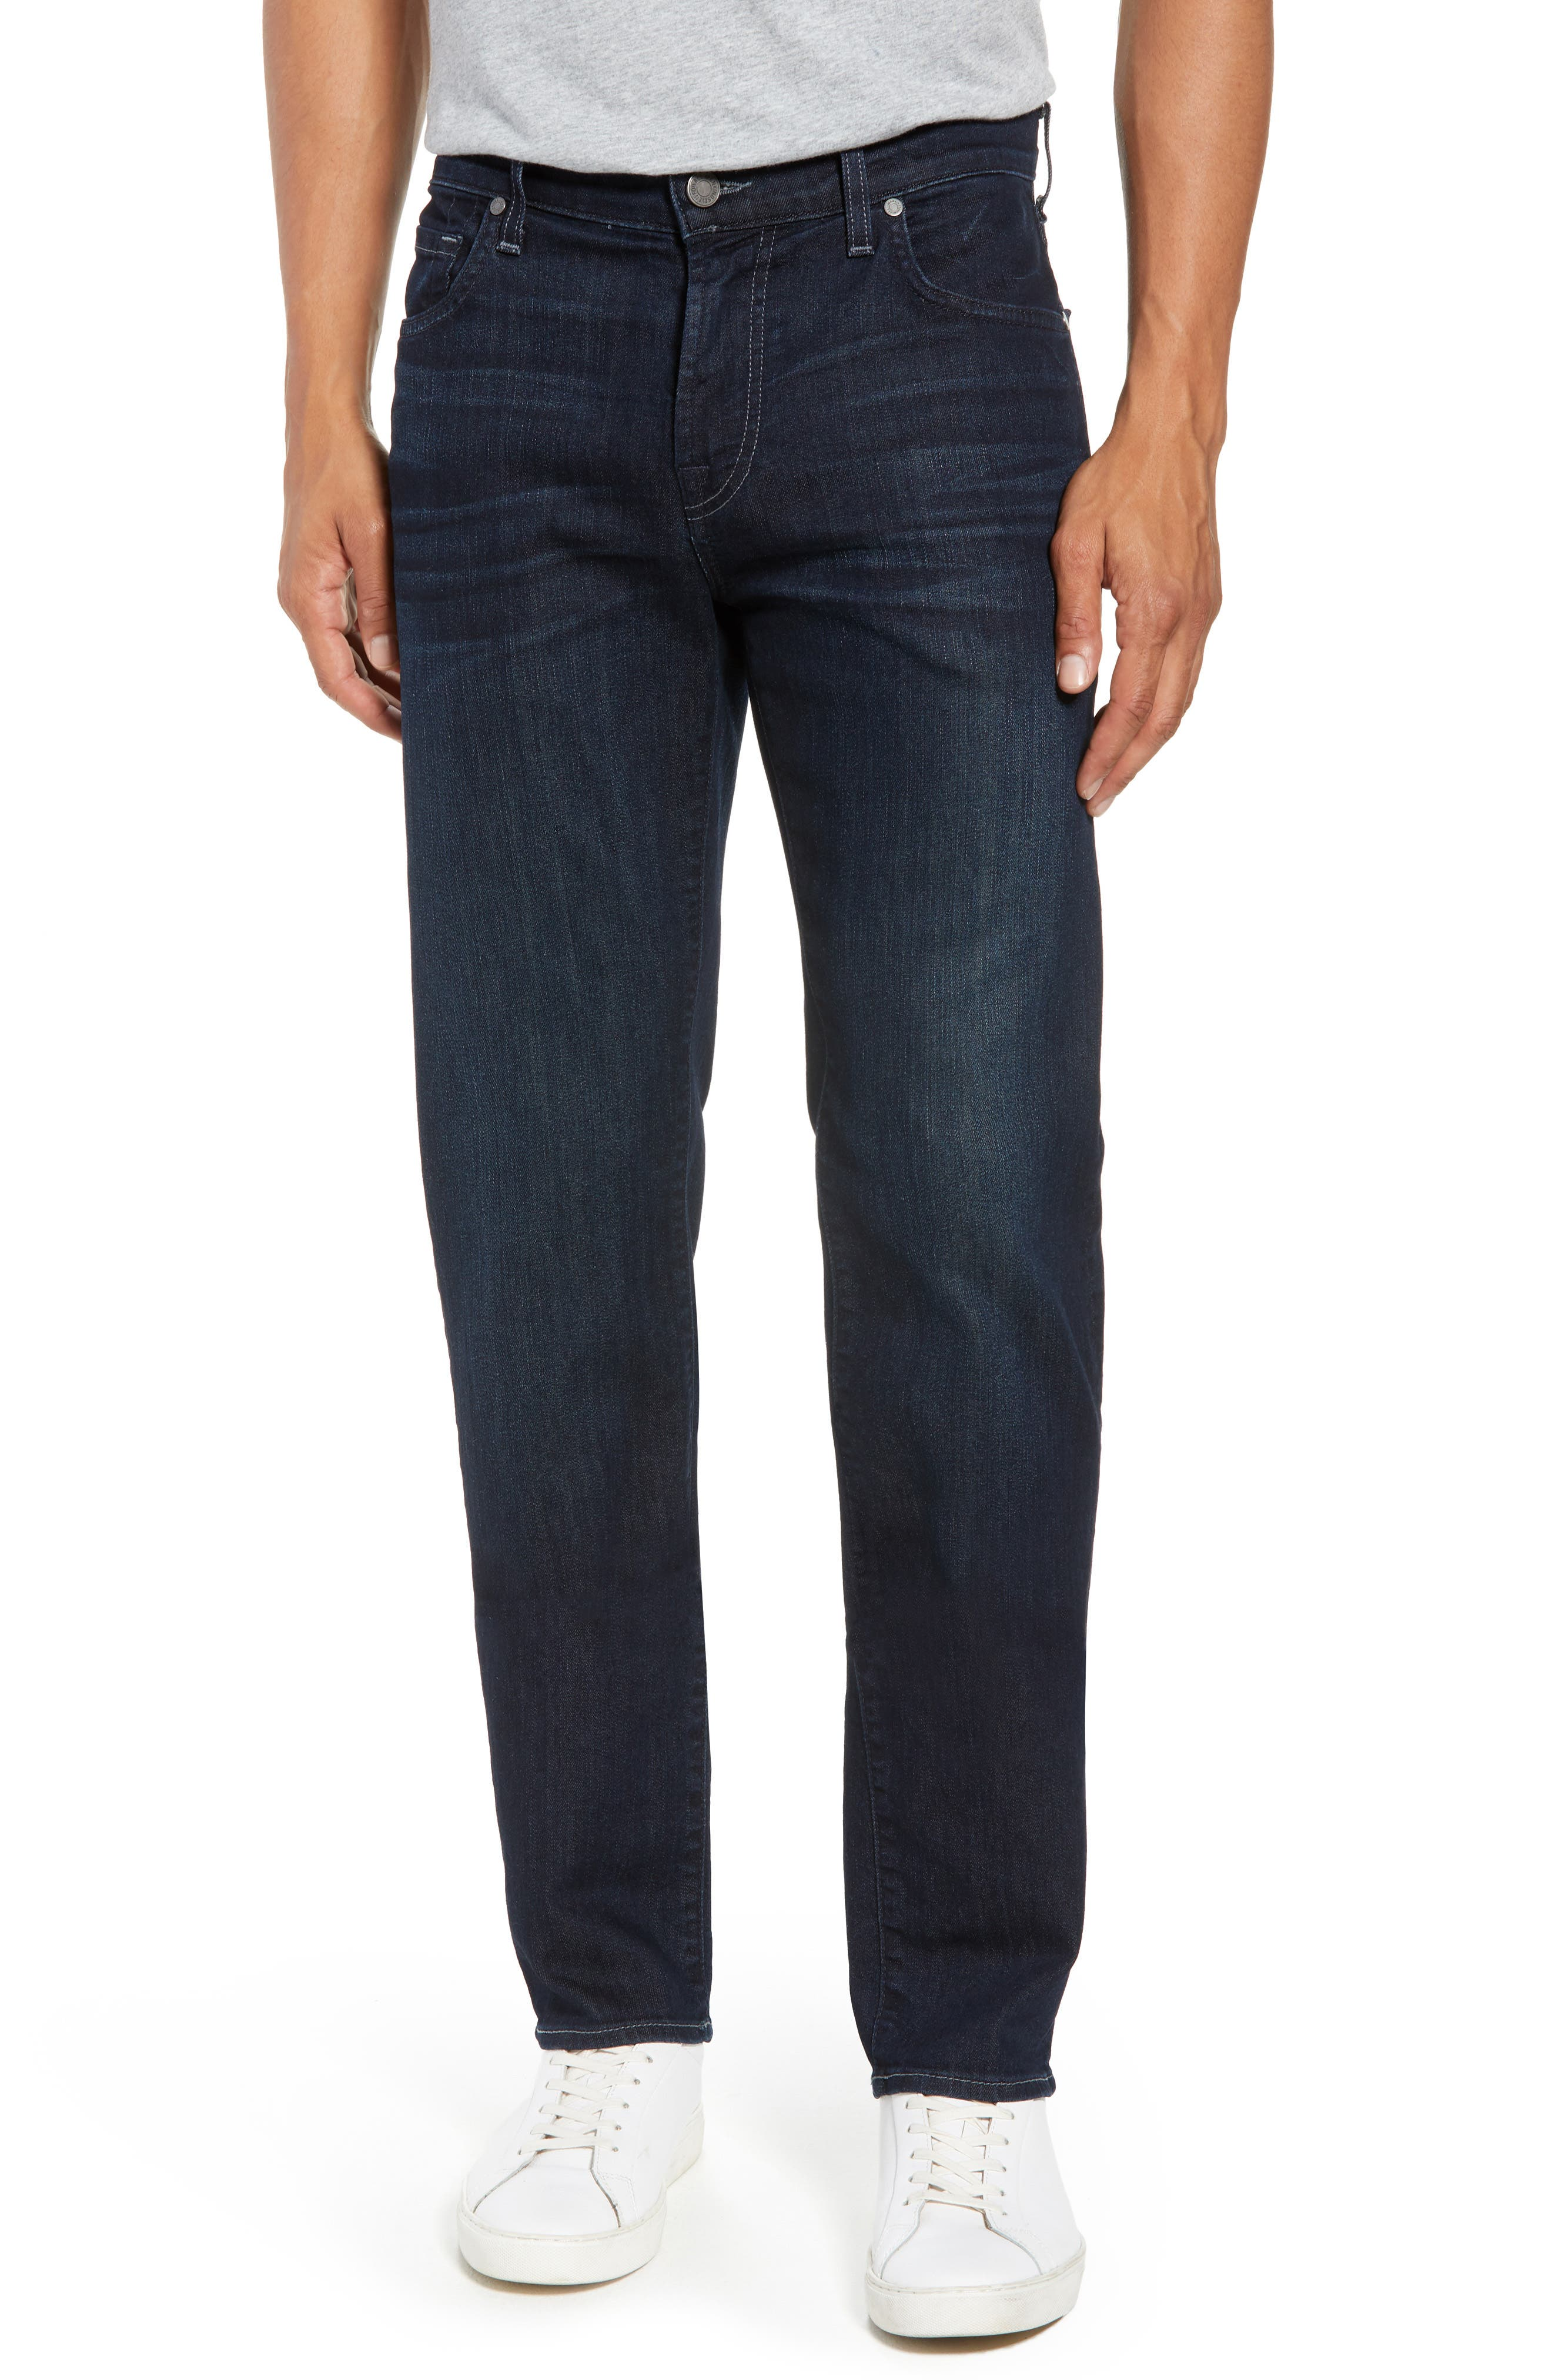 Airweft Standard Straight Leg Jeans,                             Main thumbnail 1, color,                             Perennial